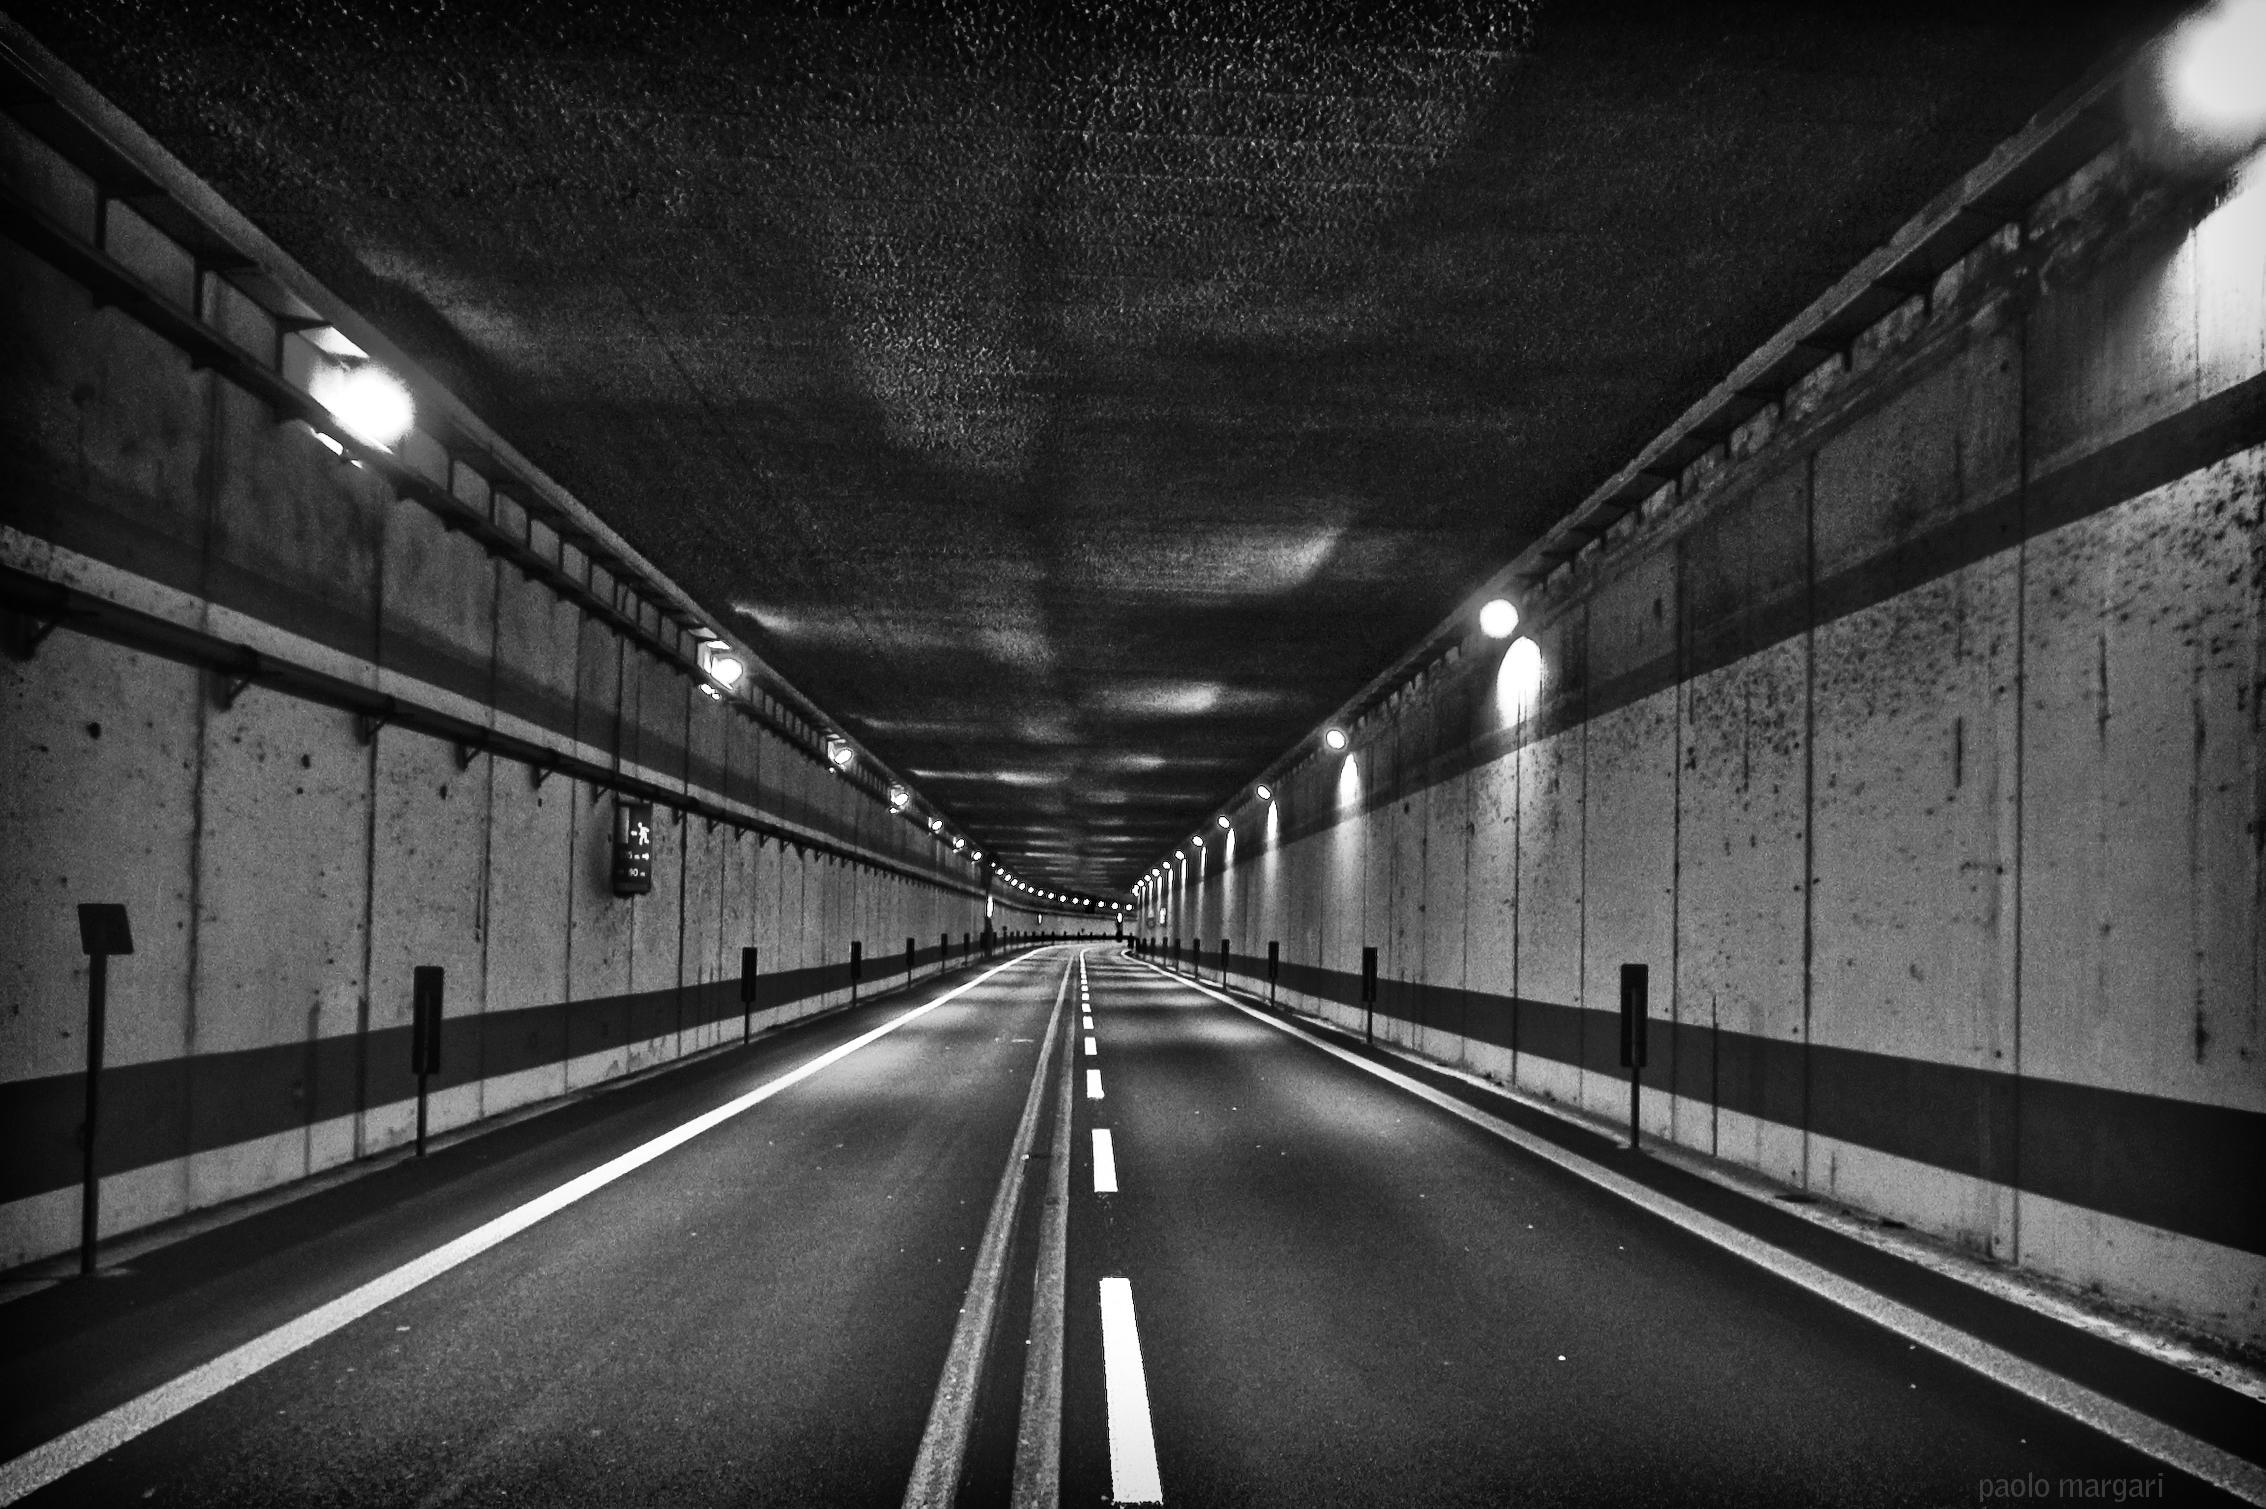 deep underground - lecce, tangenziale ovest - salento - italy